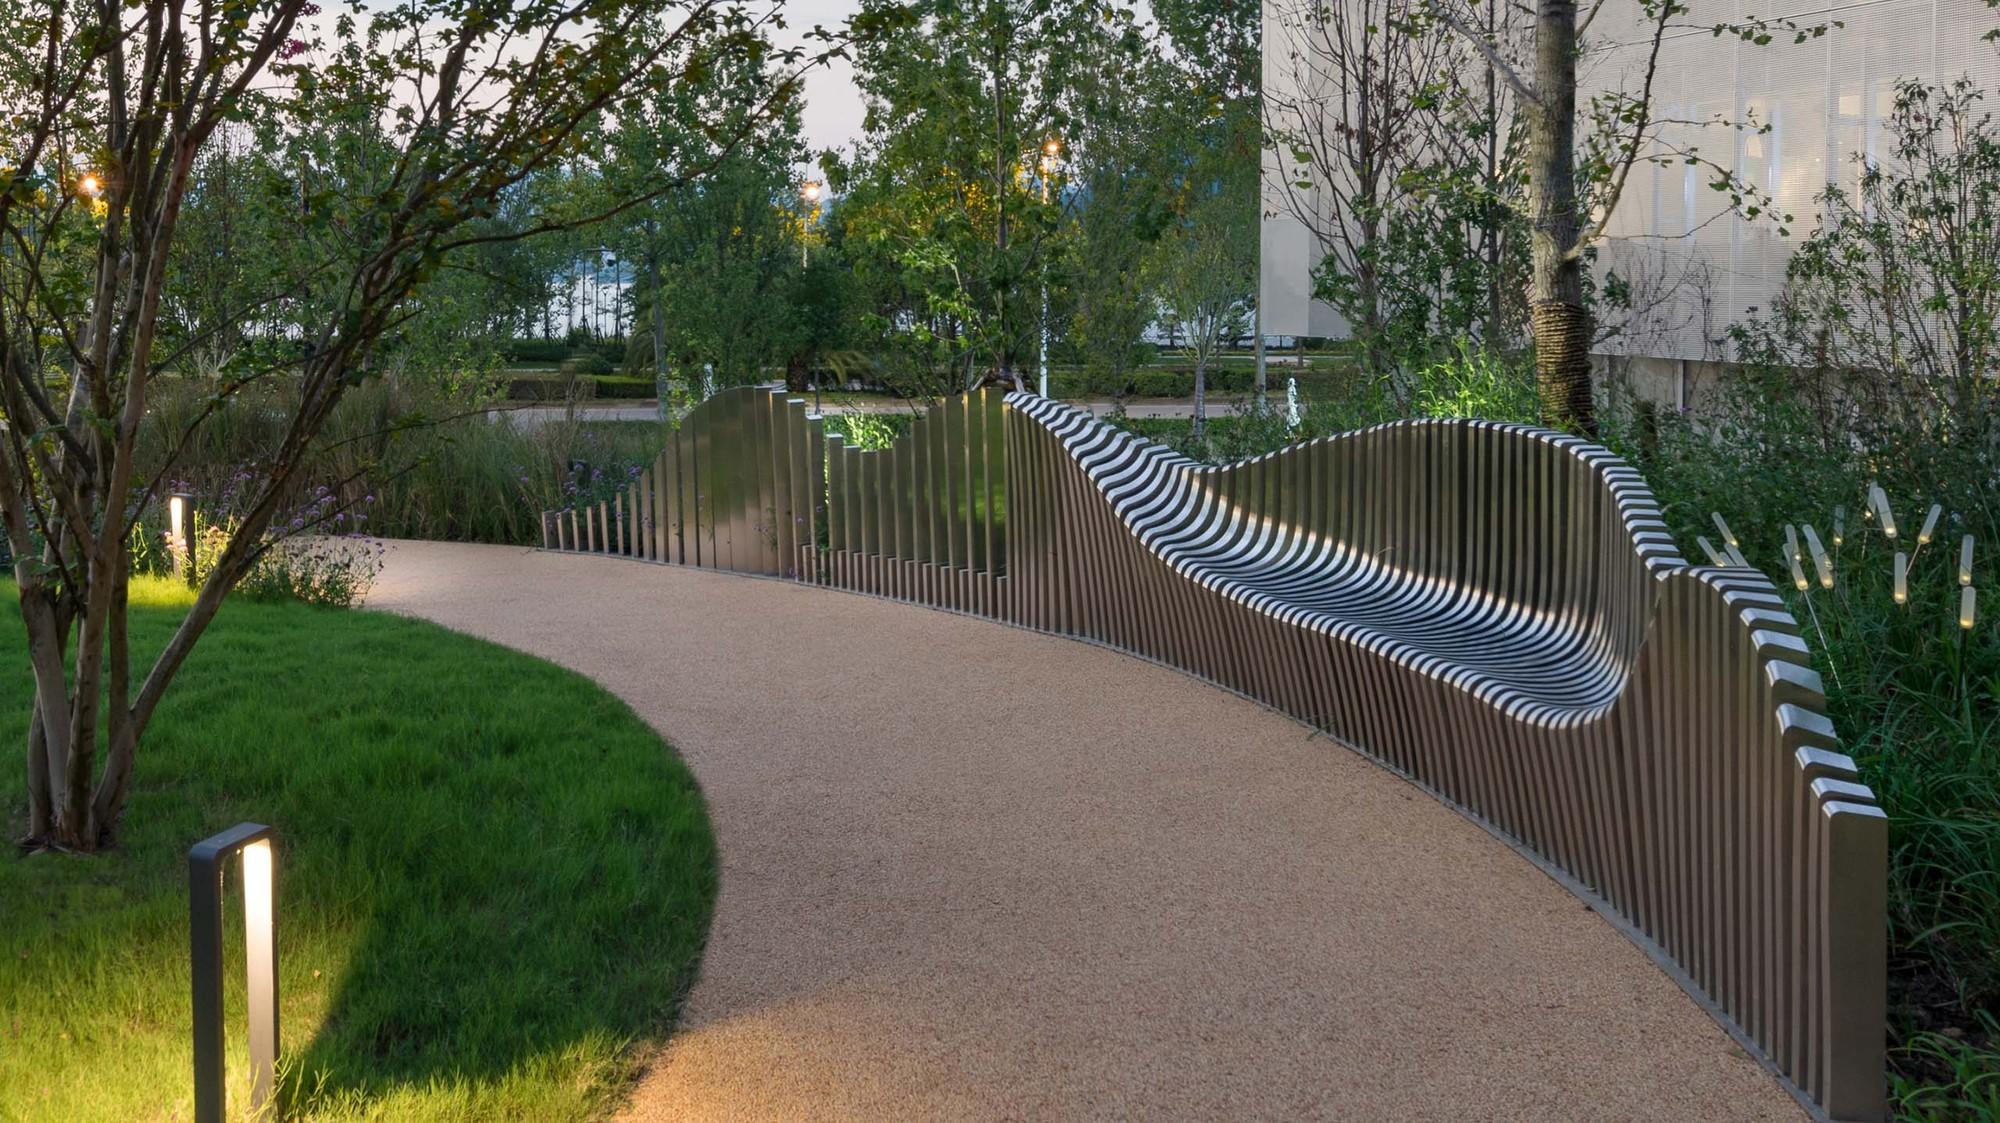 Galeria De Lakeside Garden Topos Landscape Architects 16